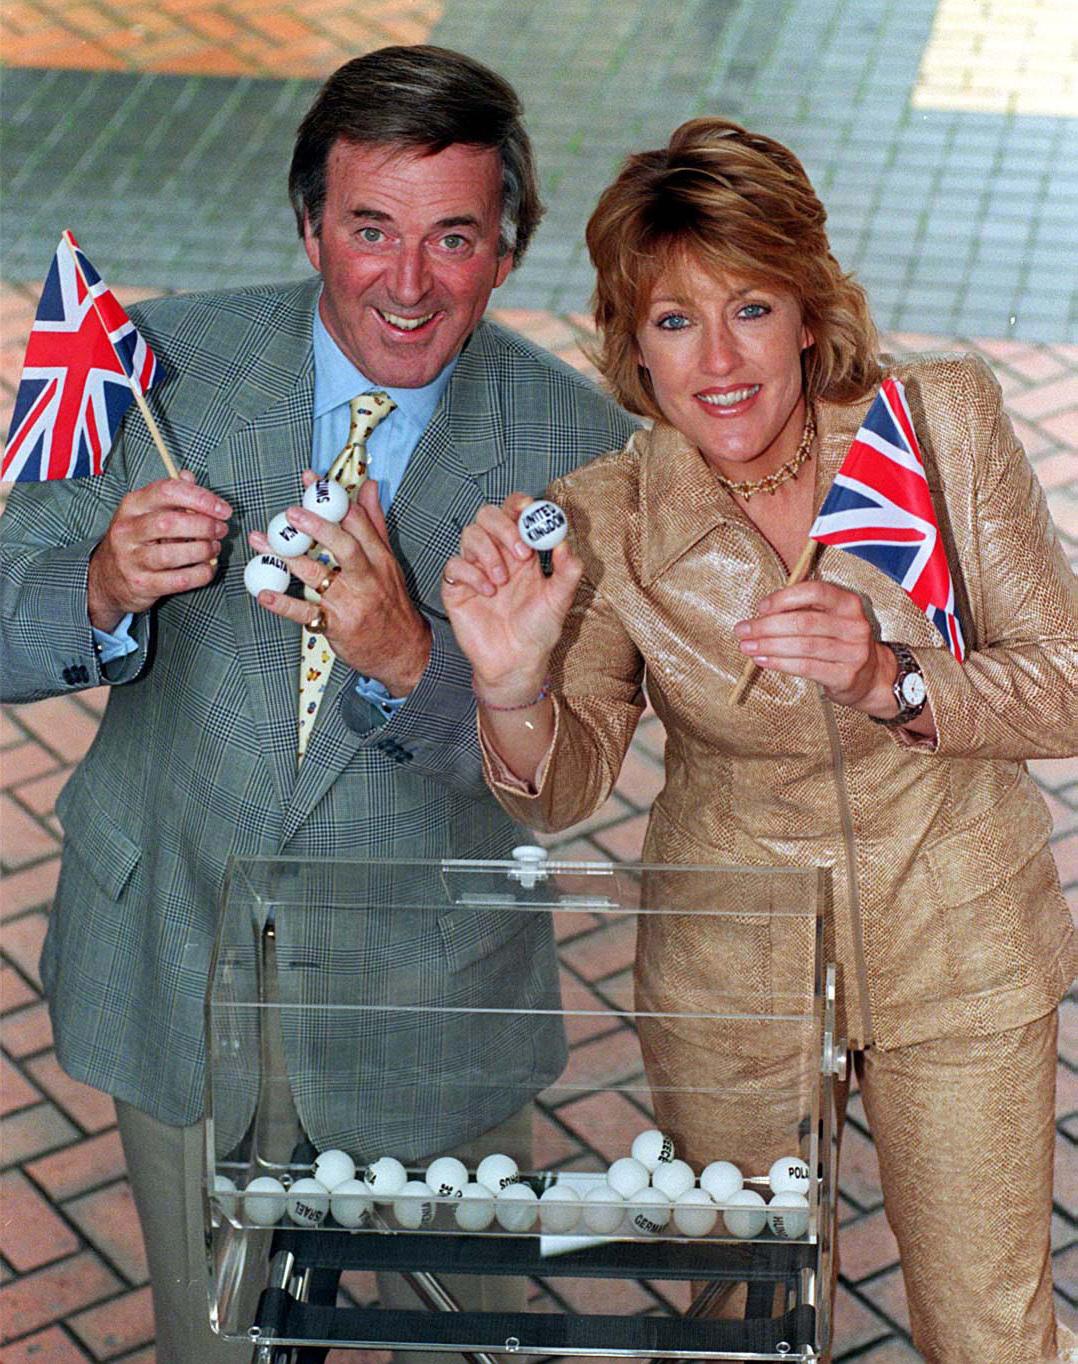 Previous Eurovision Song Contest winner Katrina and compere Terry Wogan (David Jones/PA)